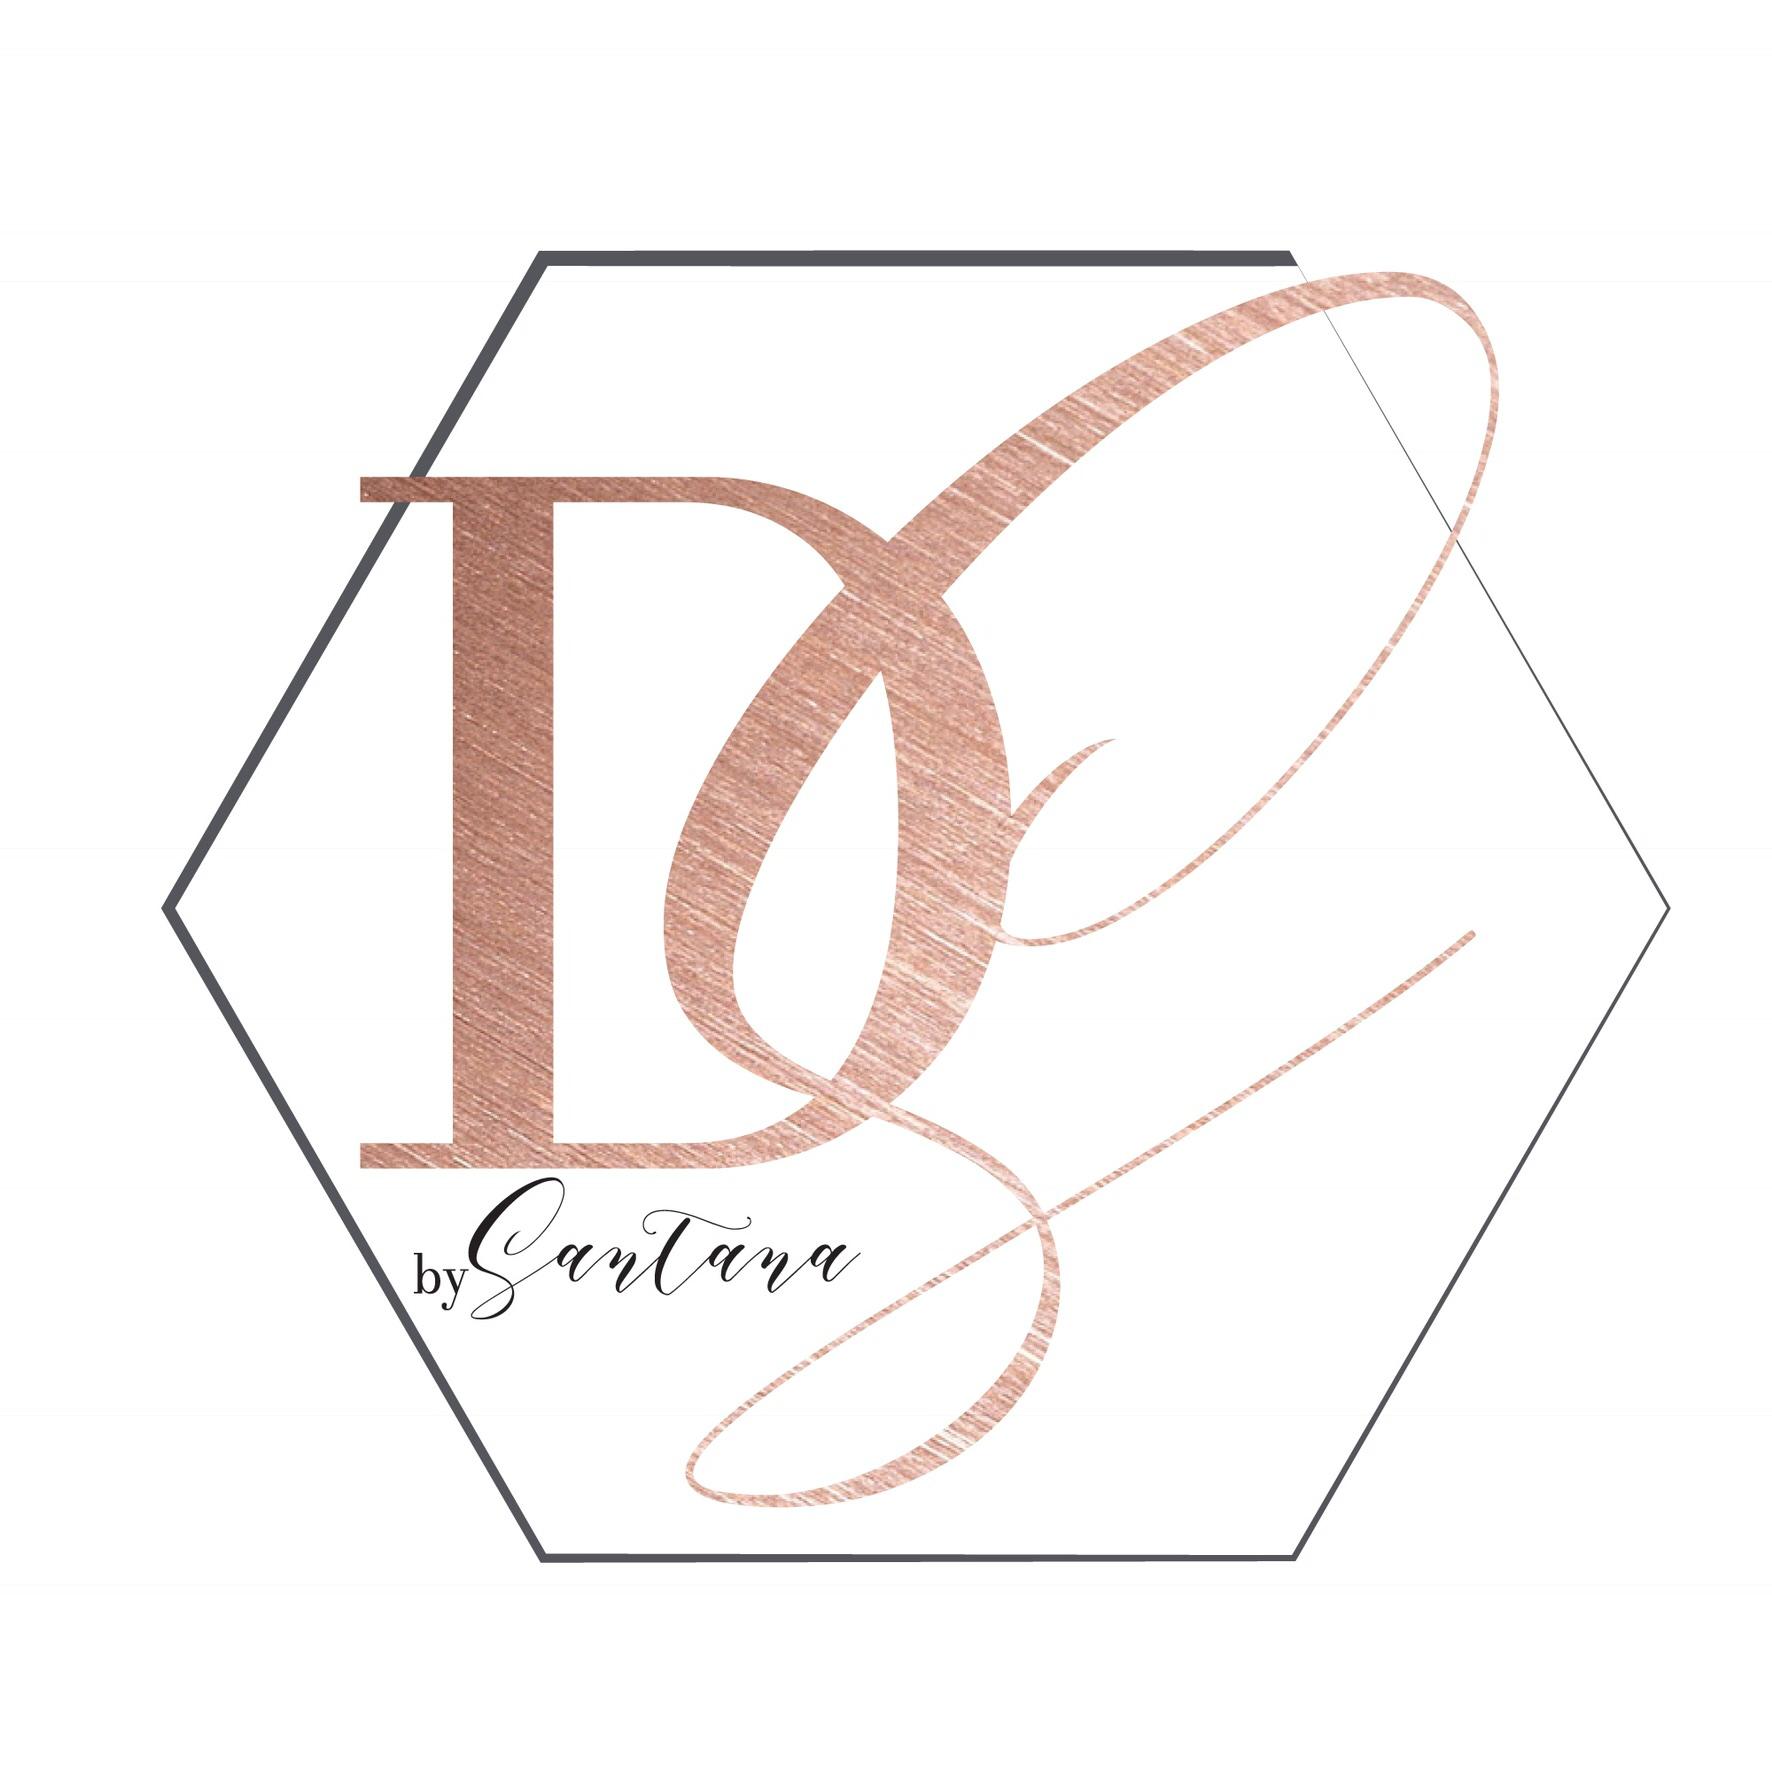 Designer Soirees by Santana primary image